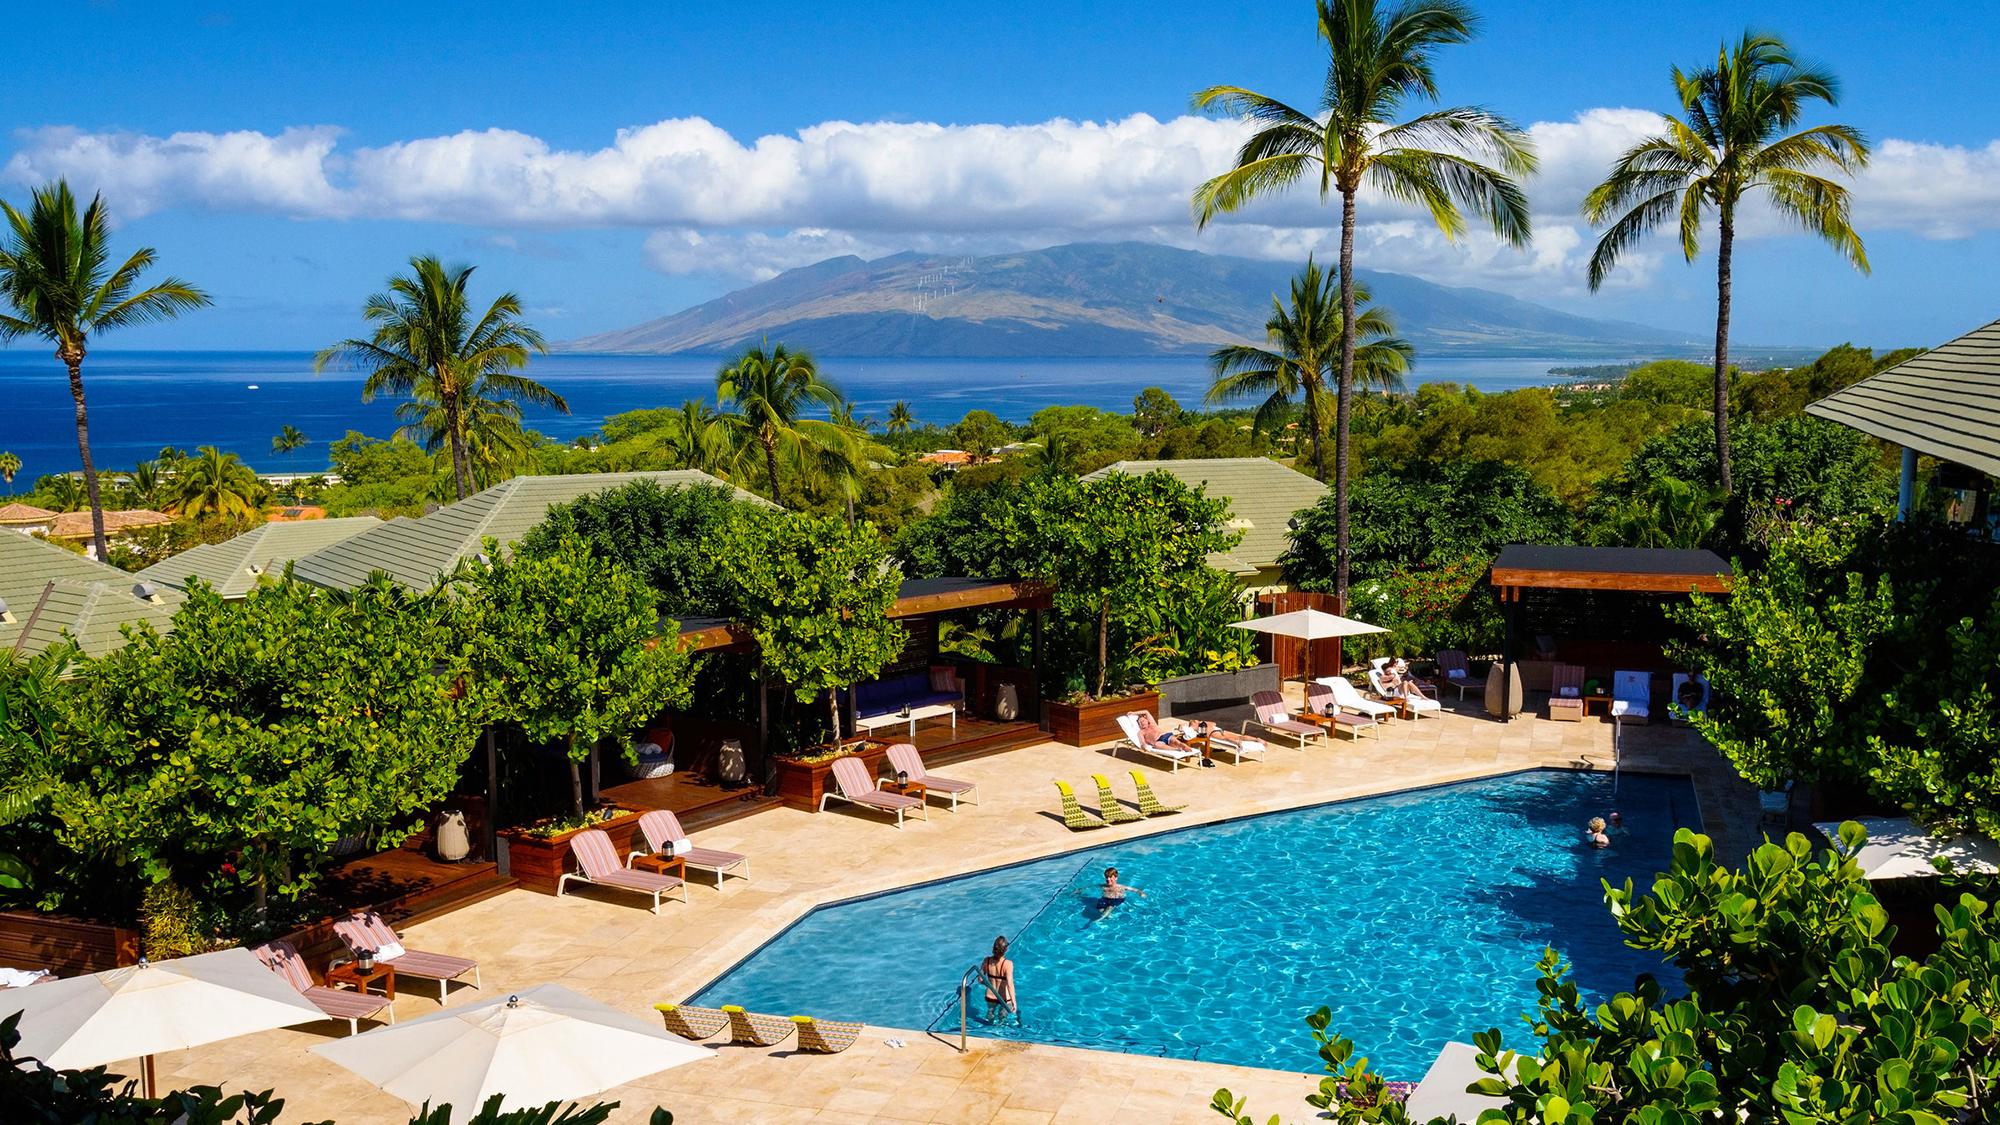 Hotel Wailea Introduces Wellness Retreat Travel Weekly